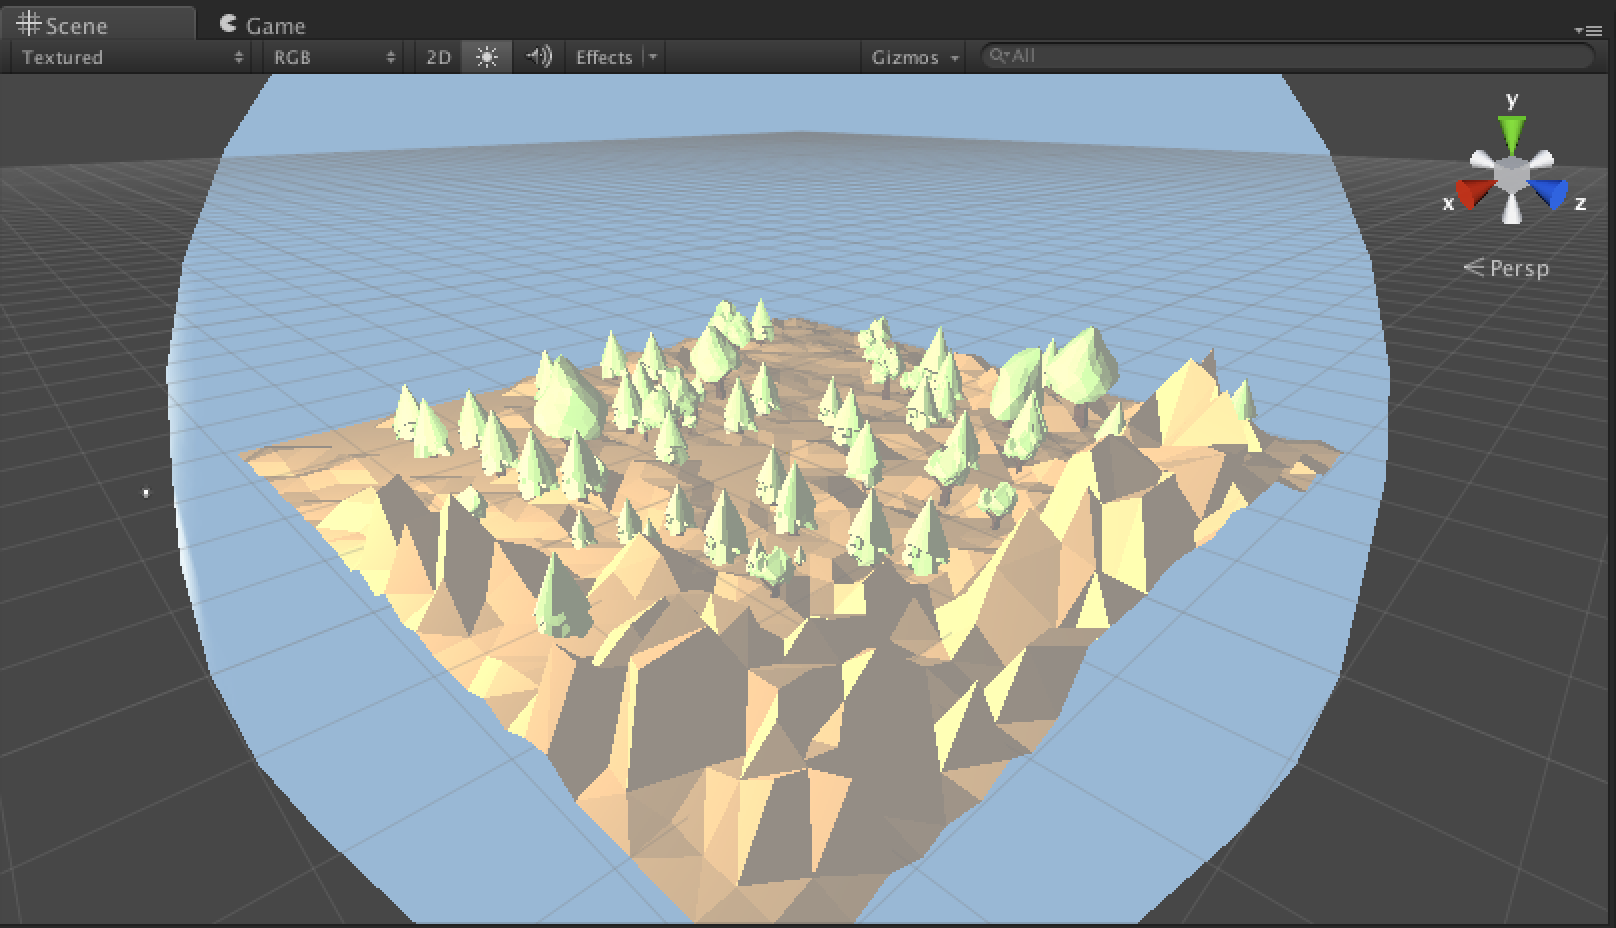 Integrating Cardboard to the AR/VR Sample